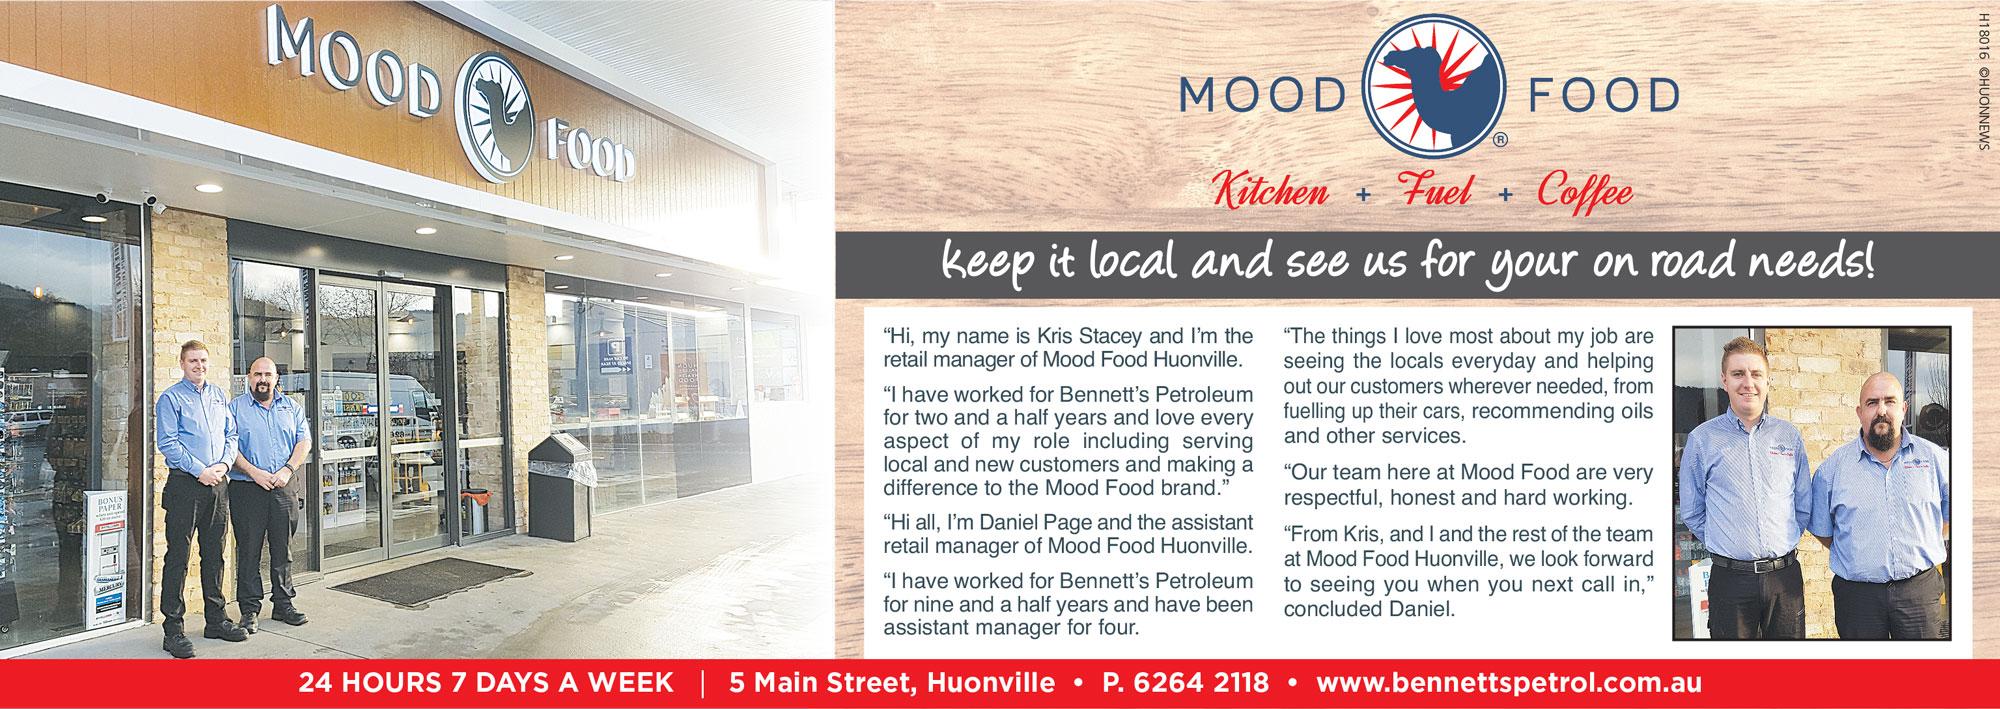 Men in Business – Mood Food Huonville